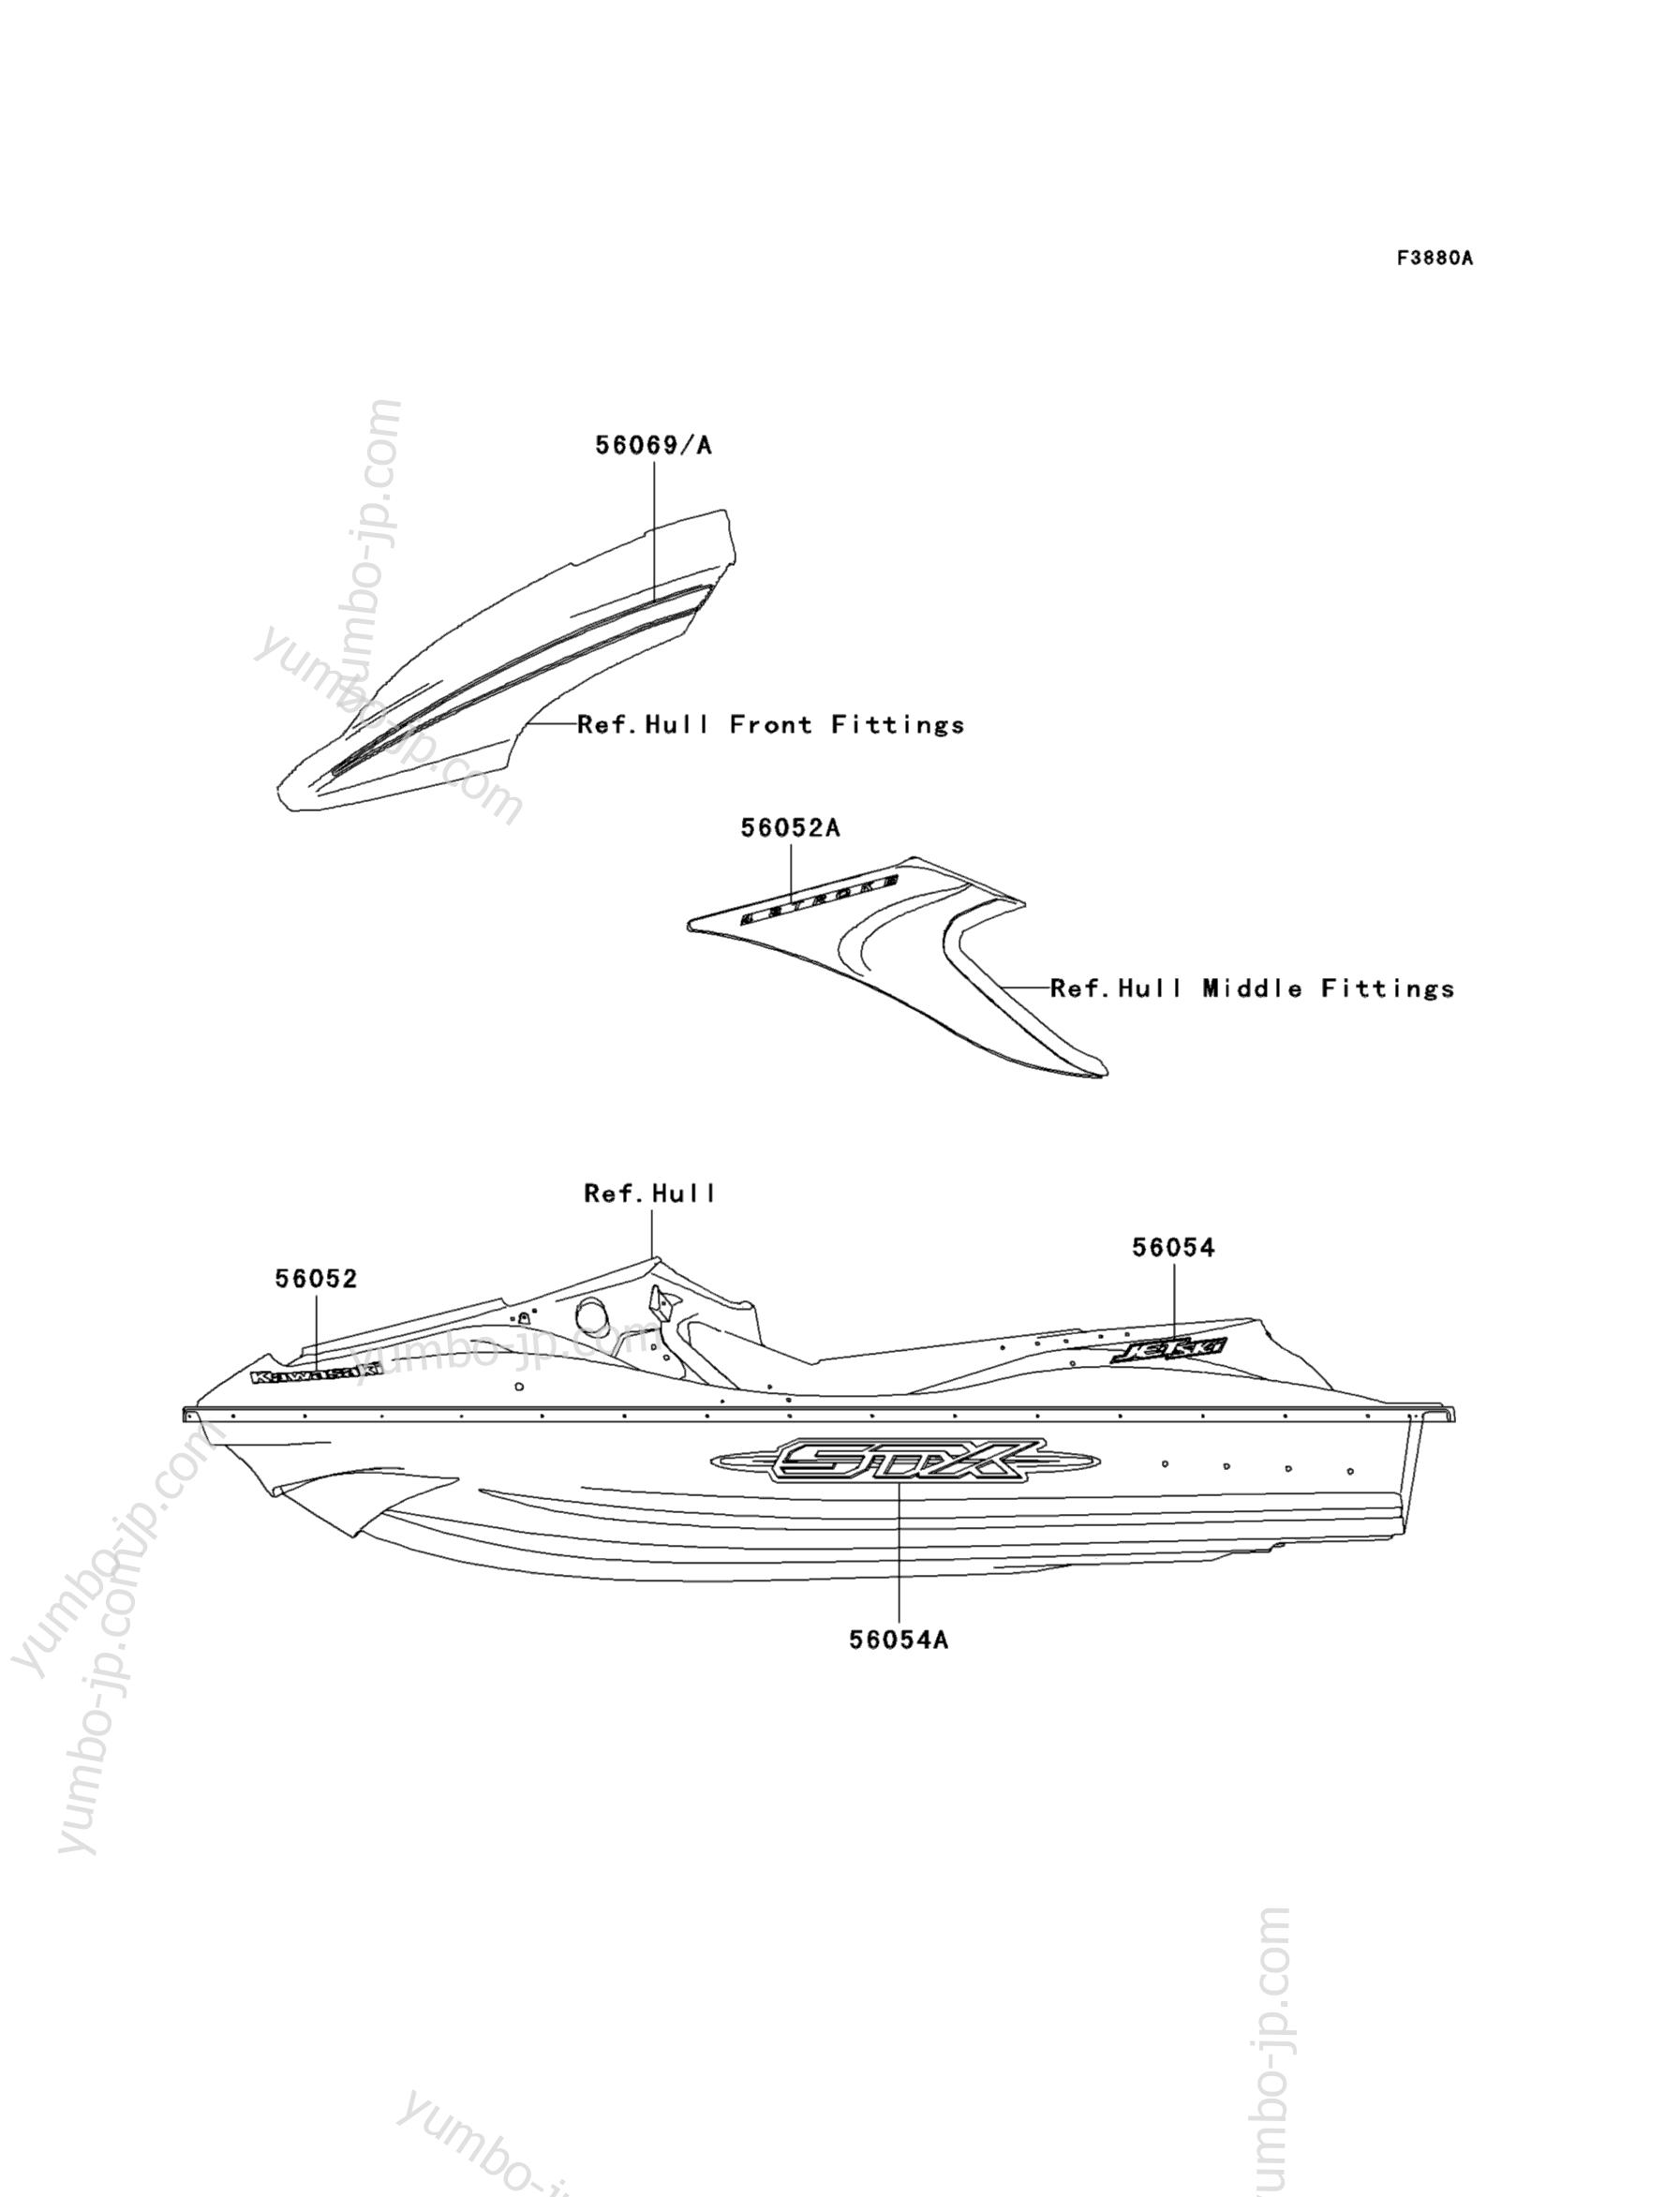 Decals(DAF) для гидроциклов KAWASAKI JET SKI STX (JT1500DAF) 2010 г.